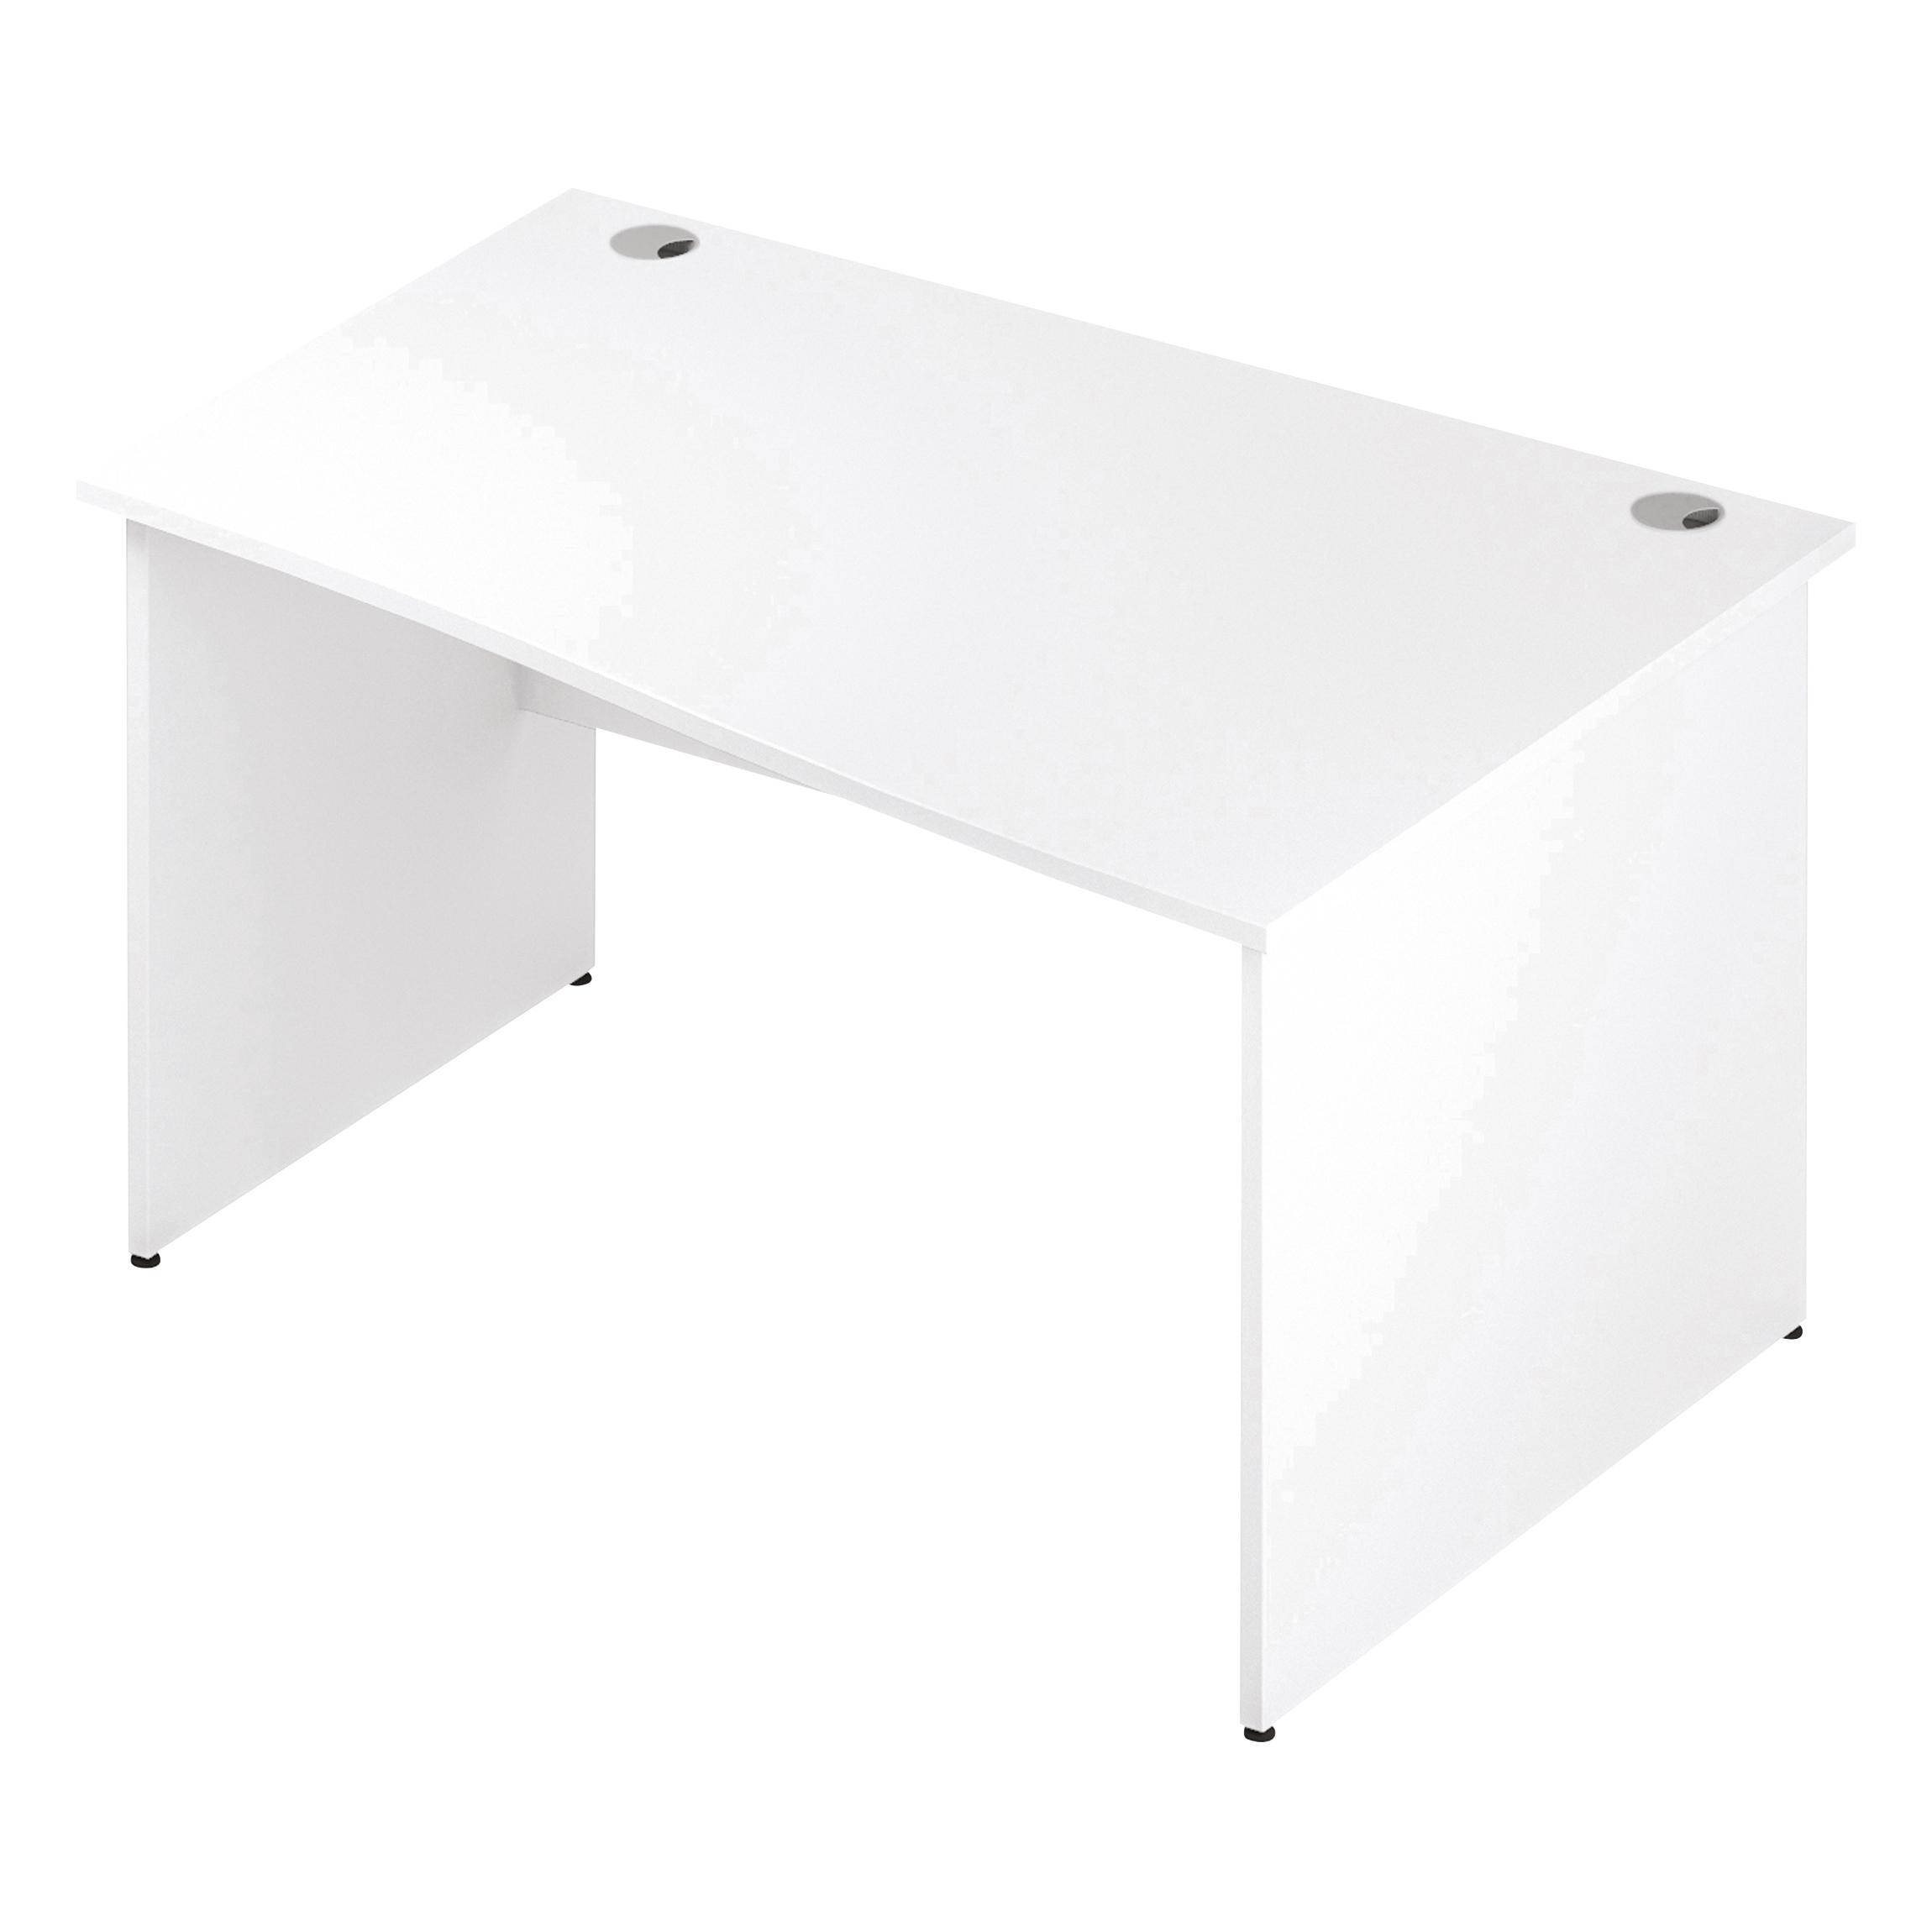 Trexus Wave Desk Right Hand Panel Leg 1400/1000mm White Ref I000398